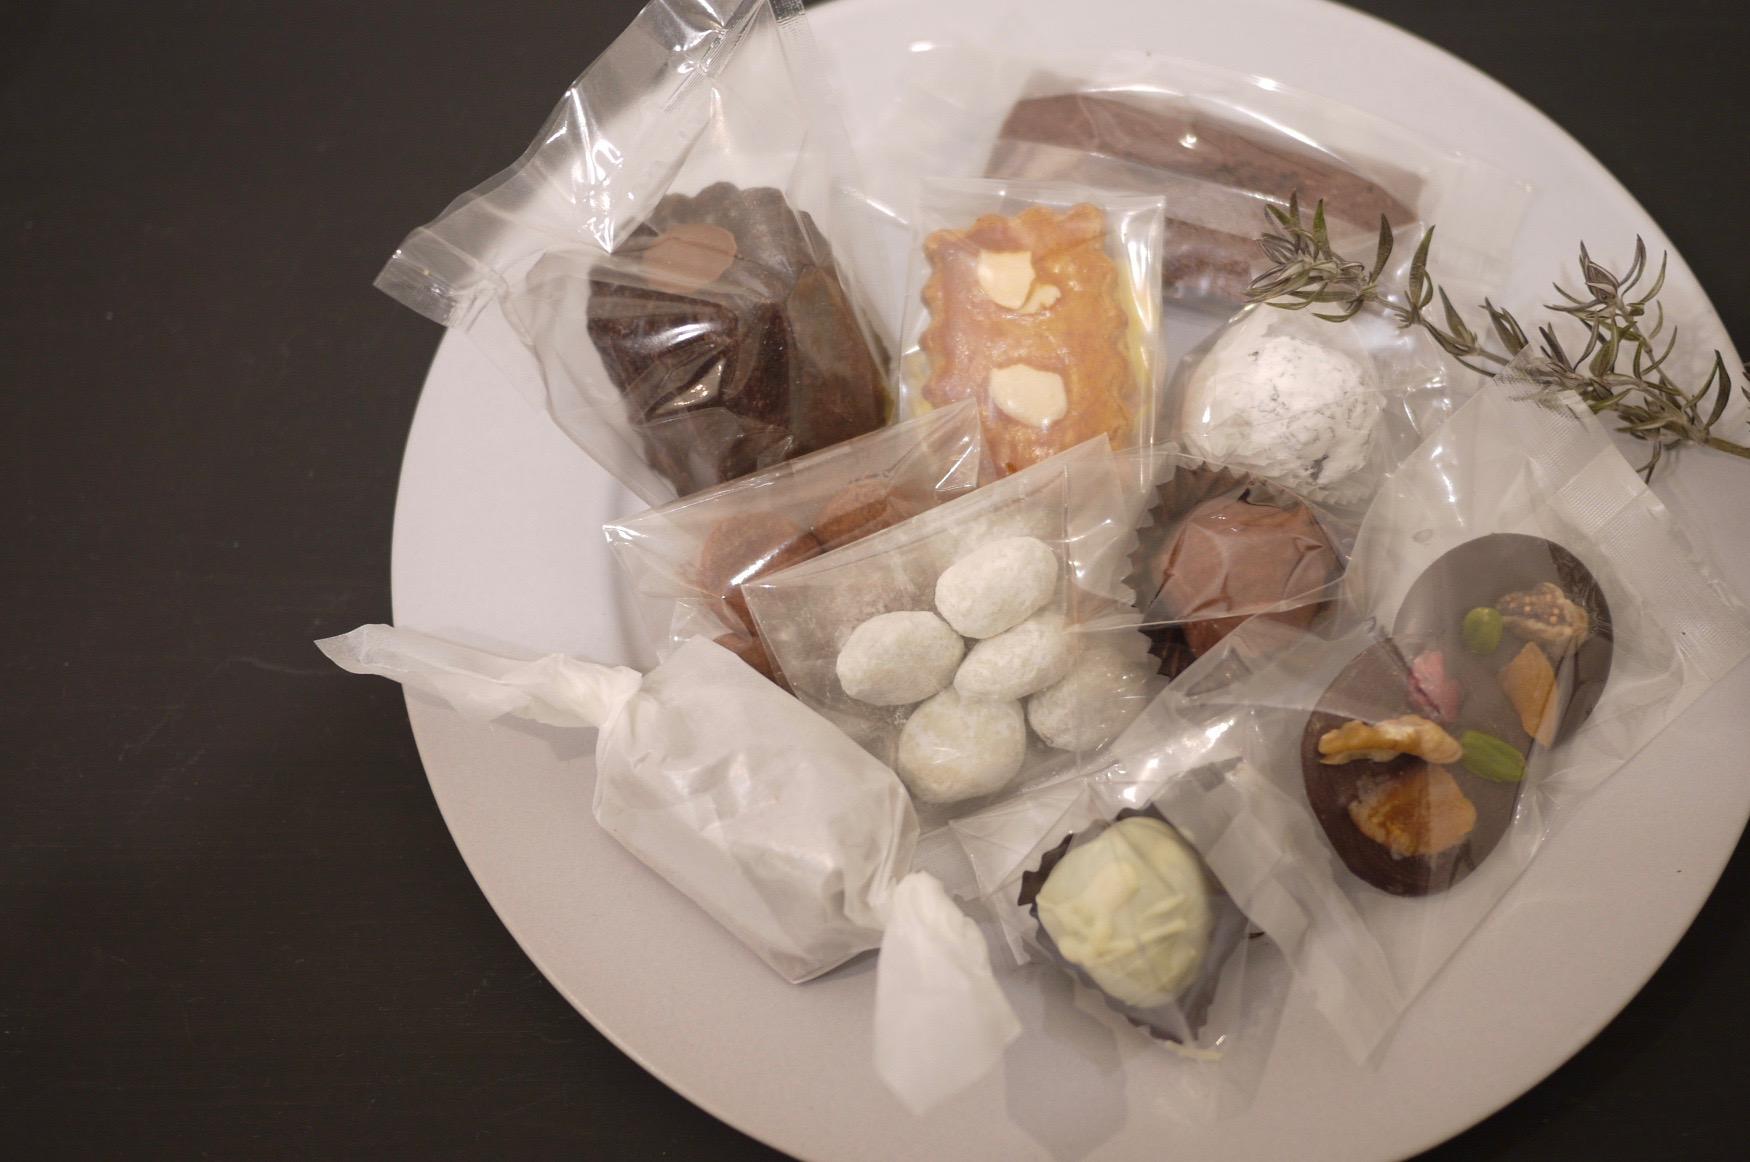 kinomoto バレンタインデーのお菓子セット 予約販売のお知らせ